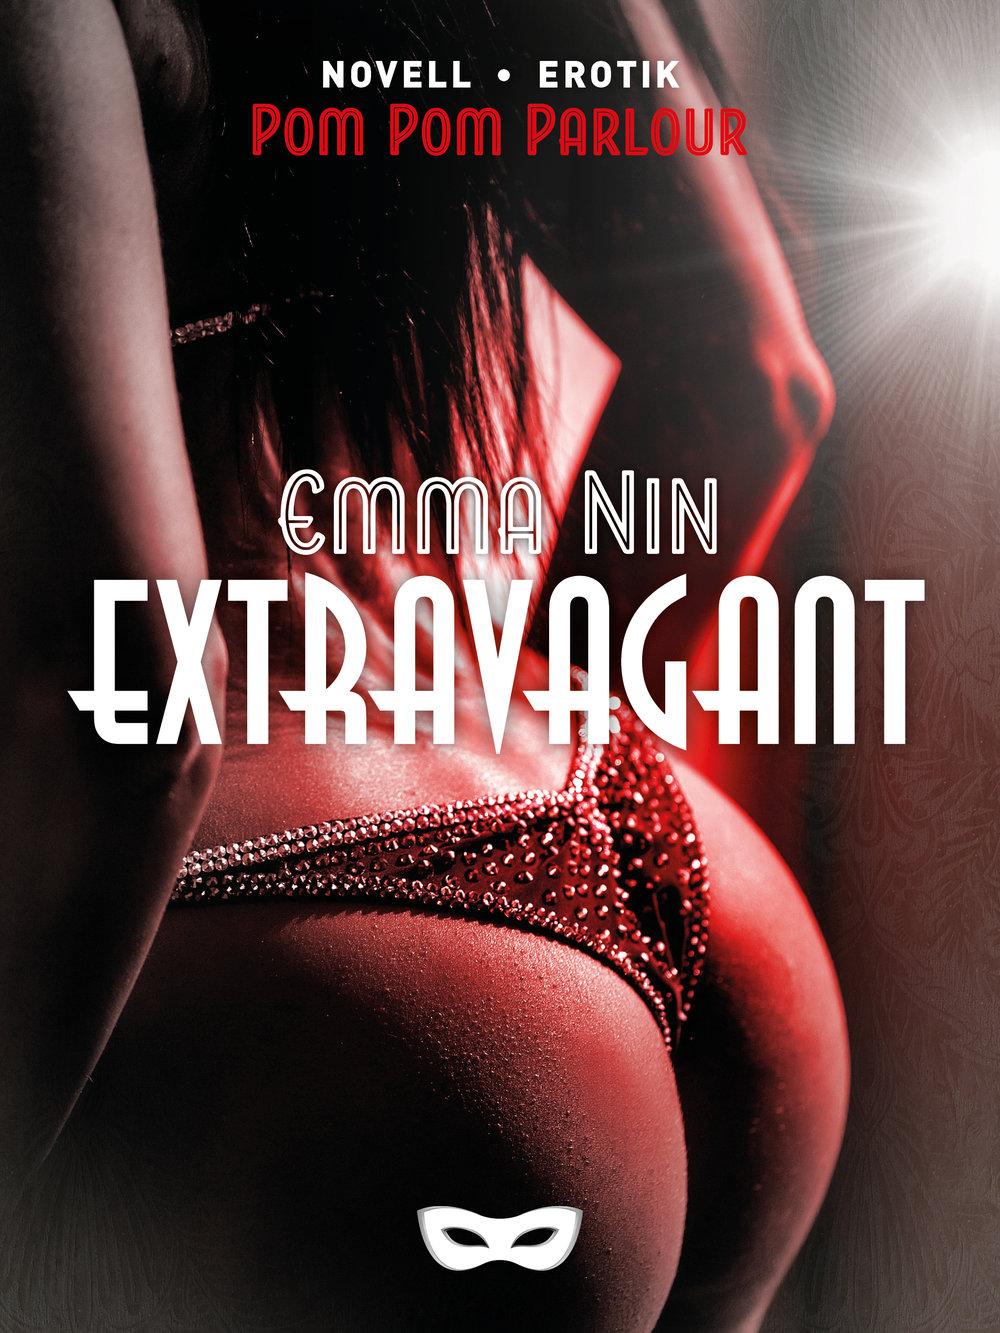 EXTRA-n_Extravagant_Emma Nin.jpg